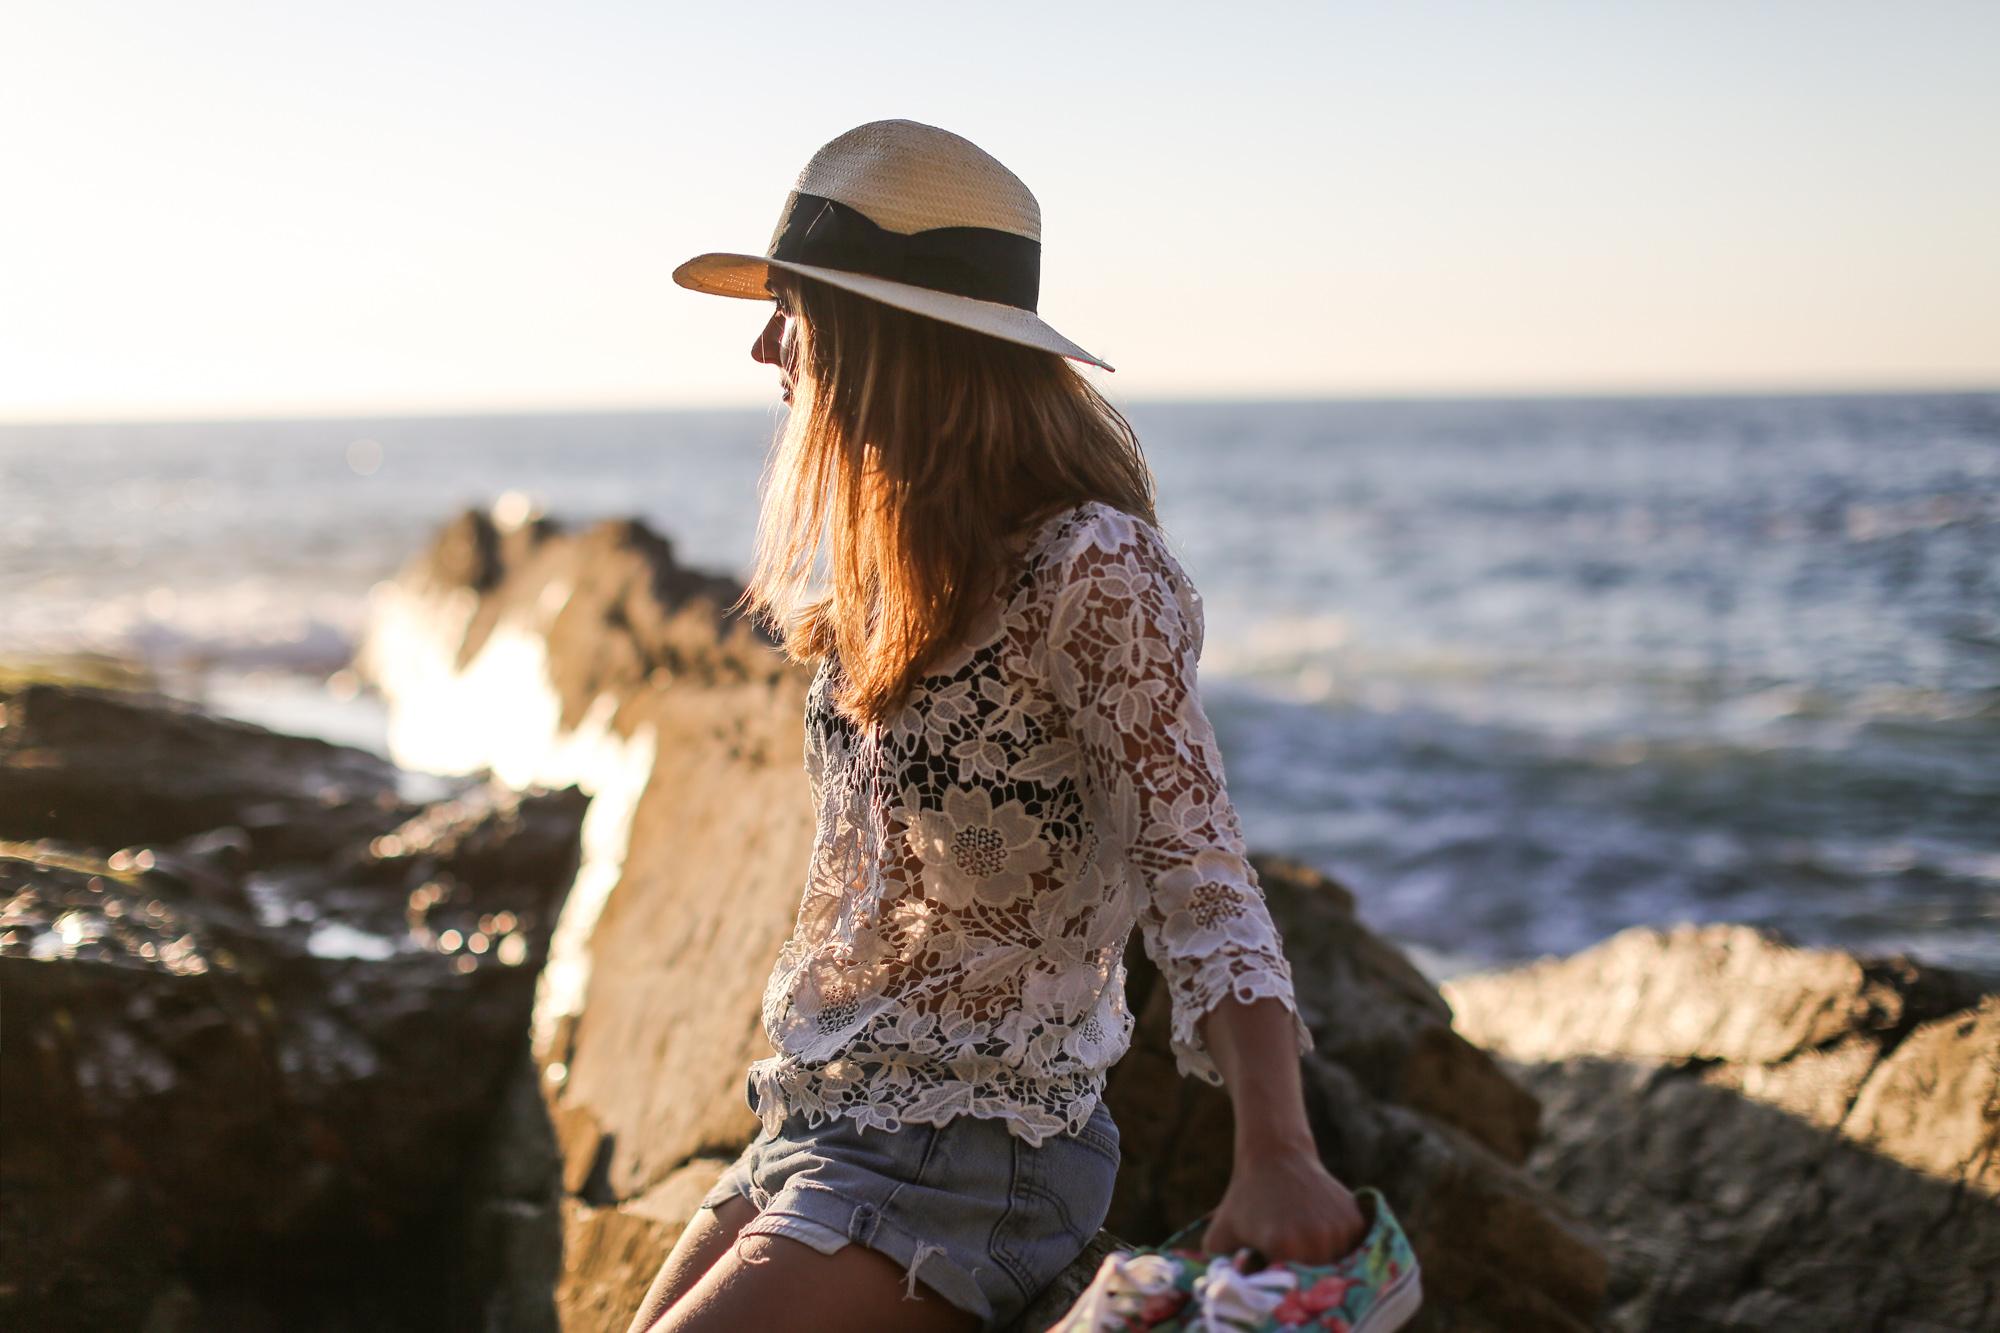 Clochet-streetstyle-vintage-levis501-crochet-top-fedora-straw-hat-4